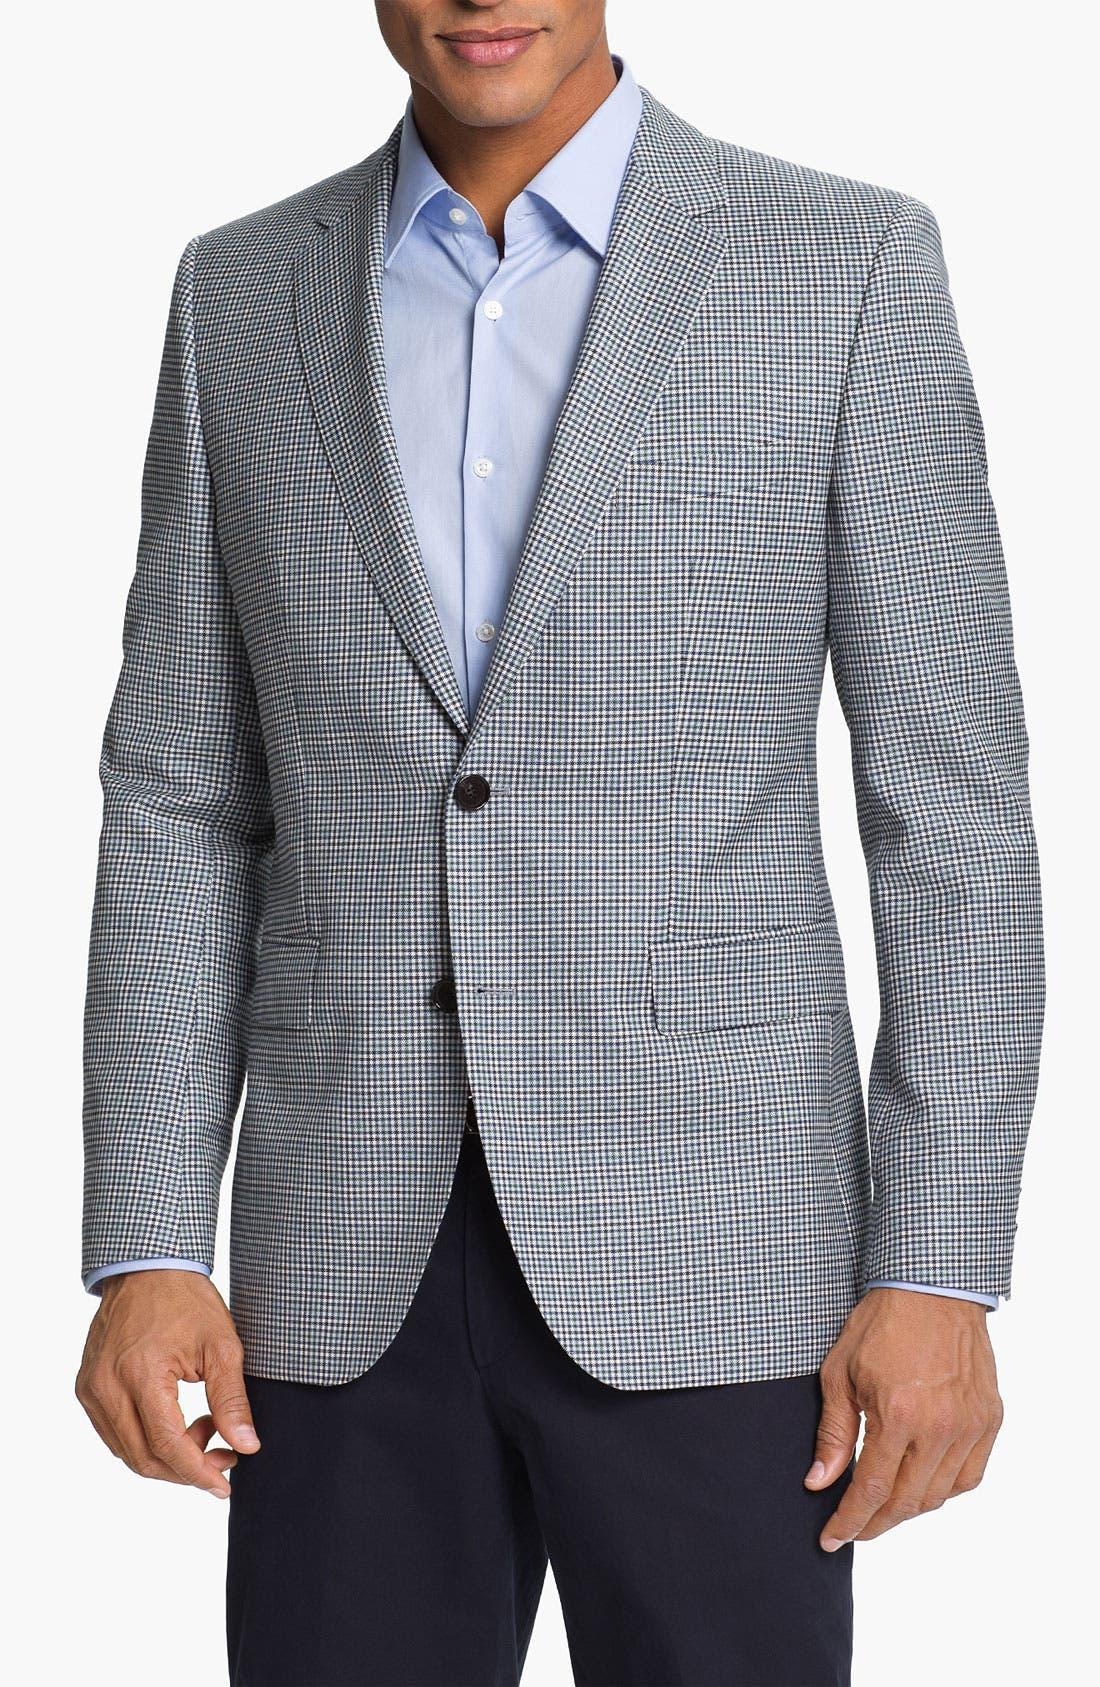 Main Image - BOSS HUGO BOSS 'James' Trim Fit Check Sportcoat